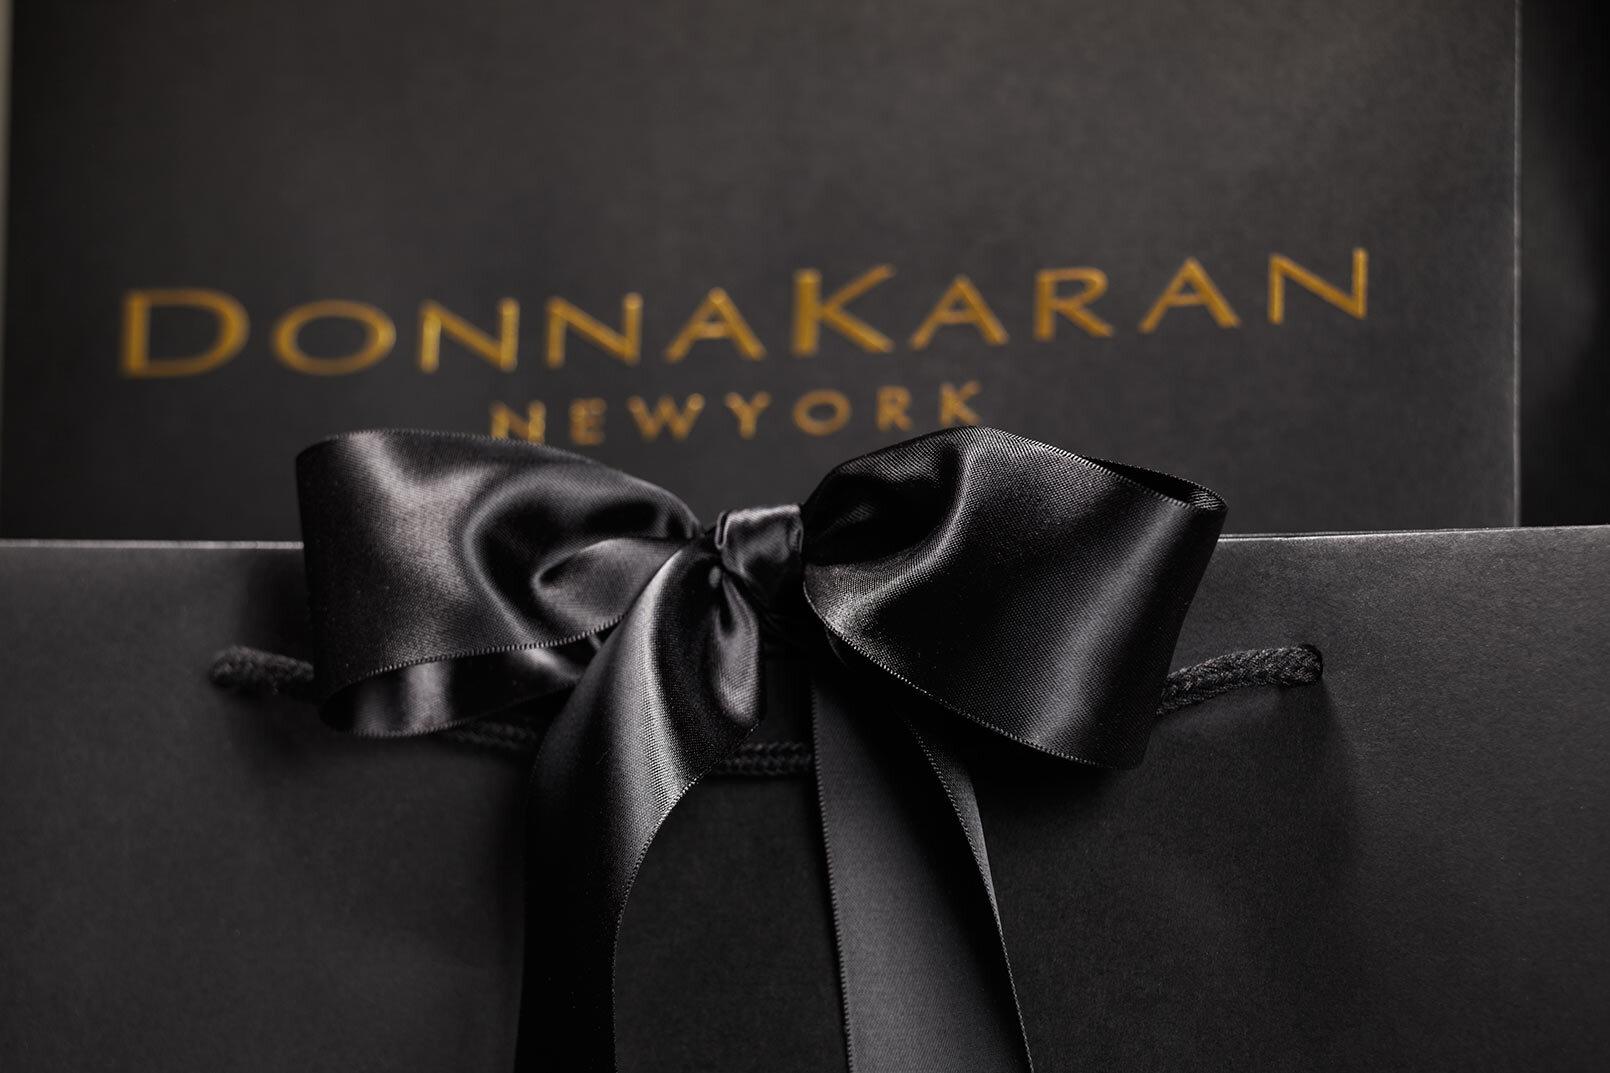 DKNY-DONNA-KARAN-NEW-York-Shopping-Bag-Design-Packaging-Company-2.2.jpg